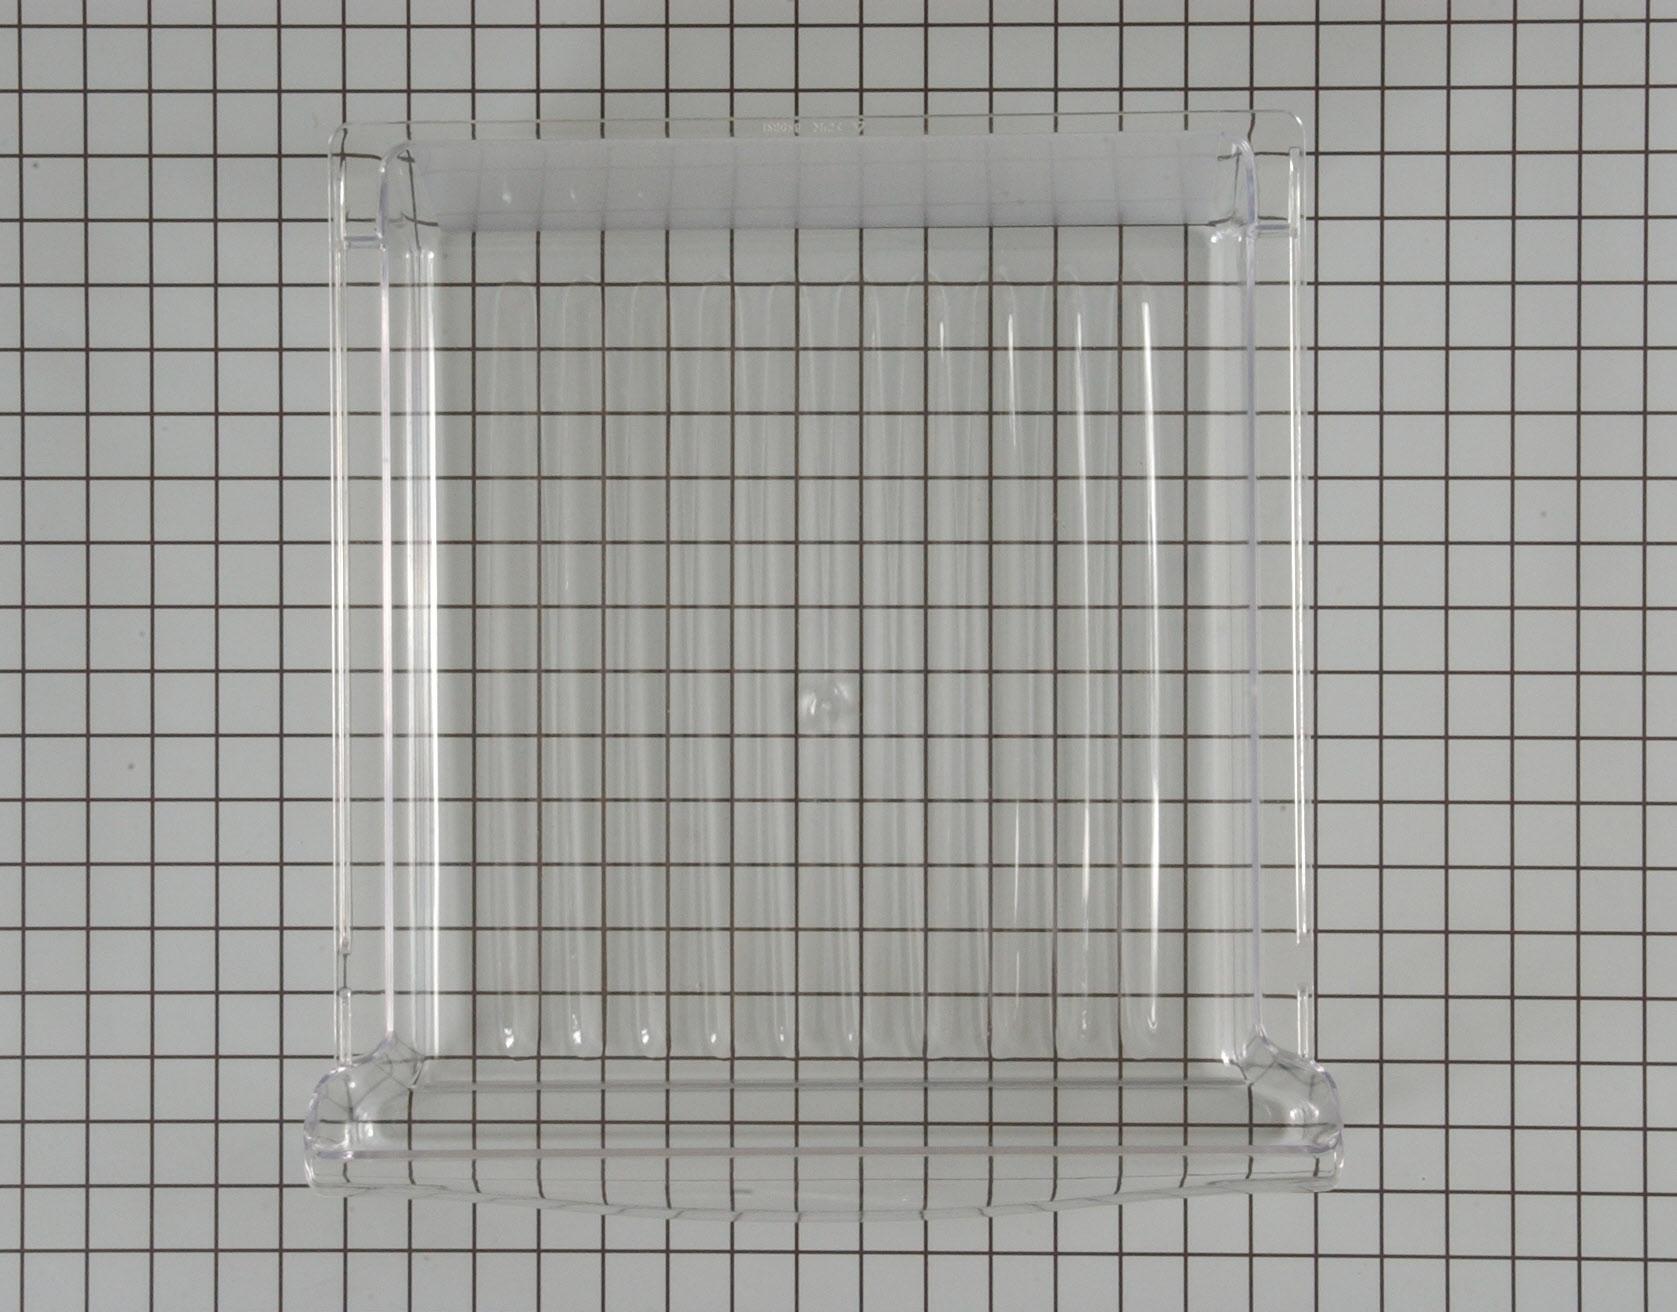 WP67004512 Whirlpool Refrigerator Part -Drawer